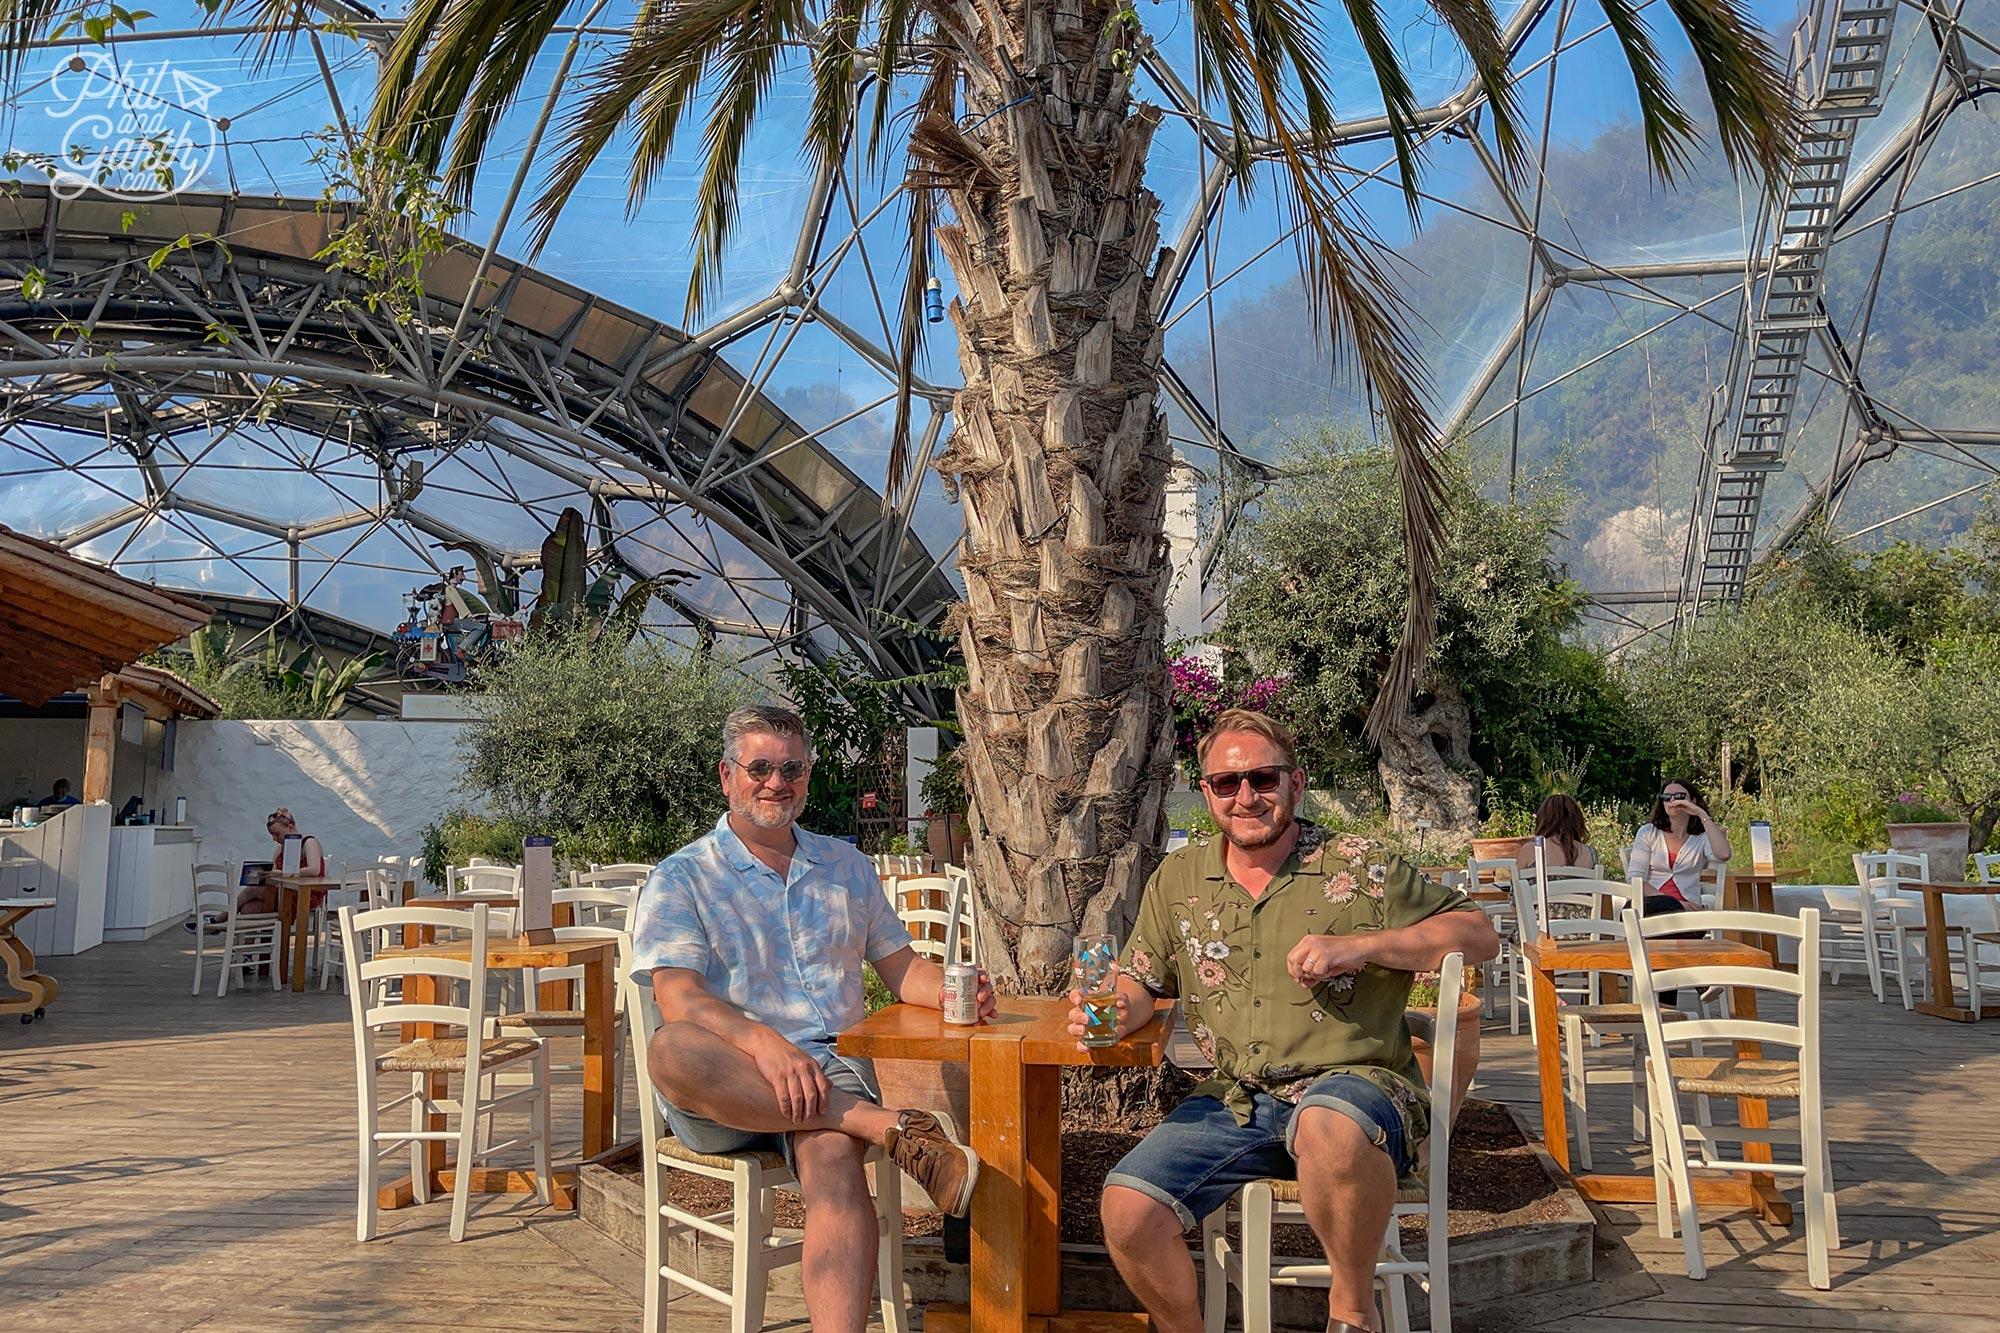 Enjoying some drinks at the Med Terrace restaurant inside the Mediterranean biome